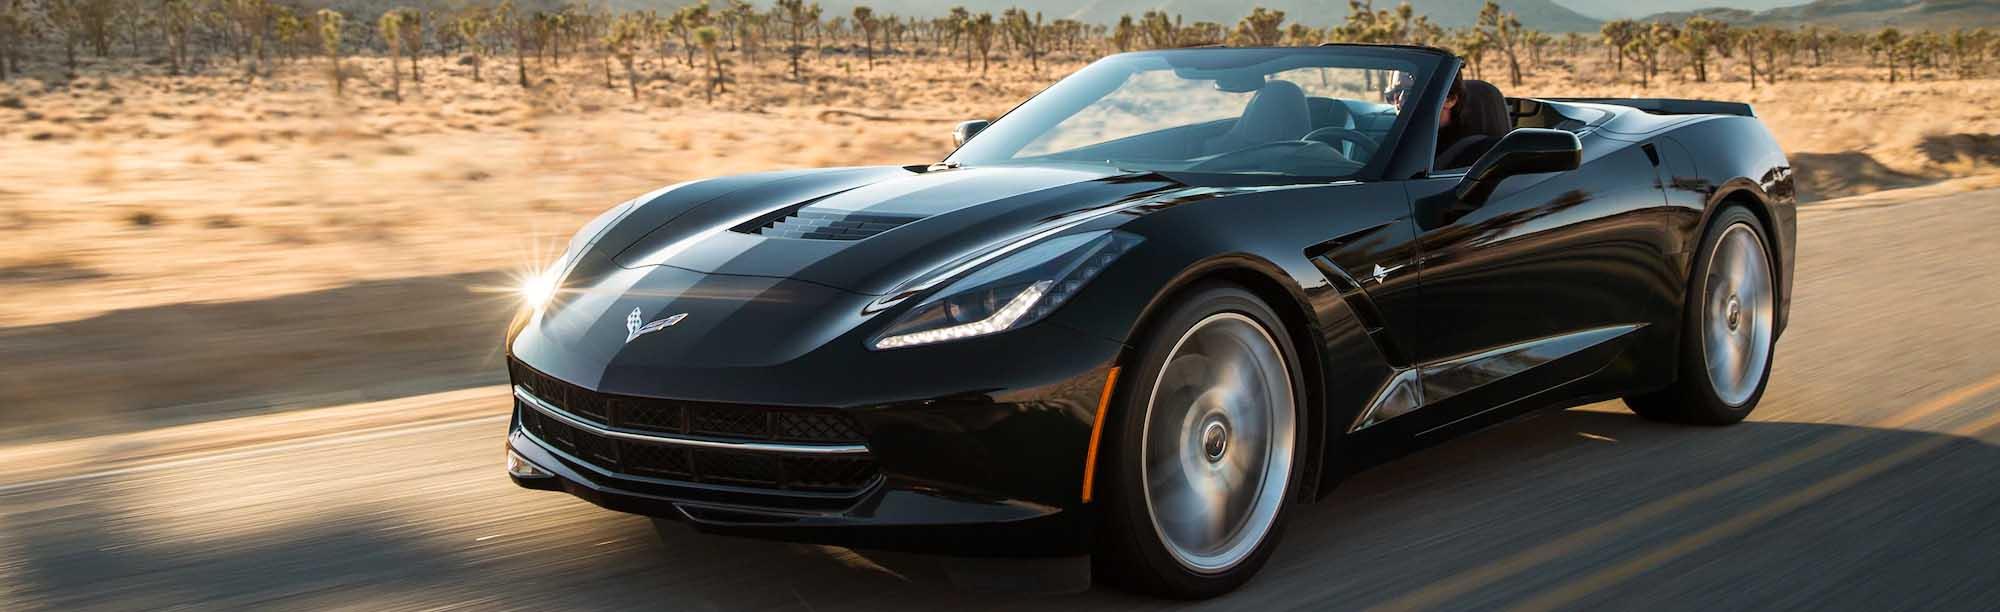 2020 Corvette Stingray On Road